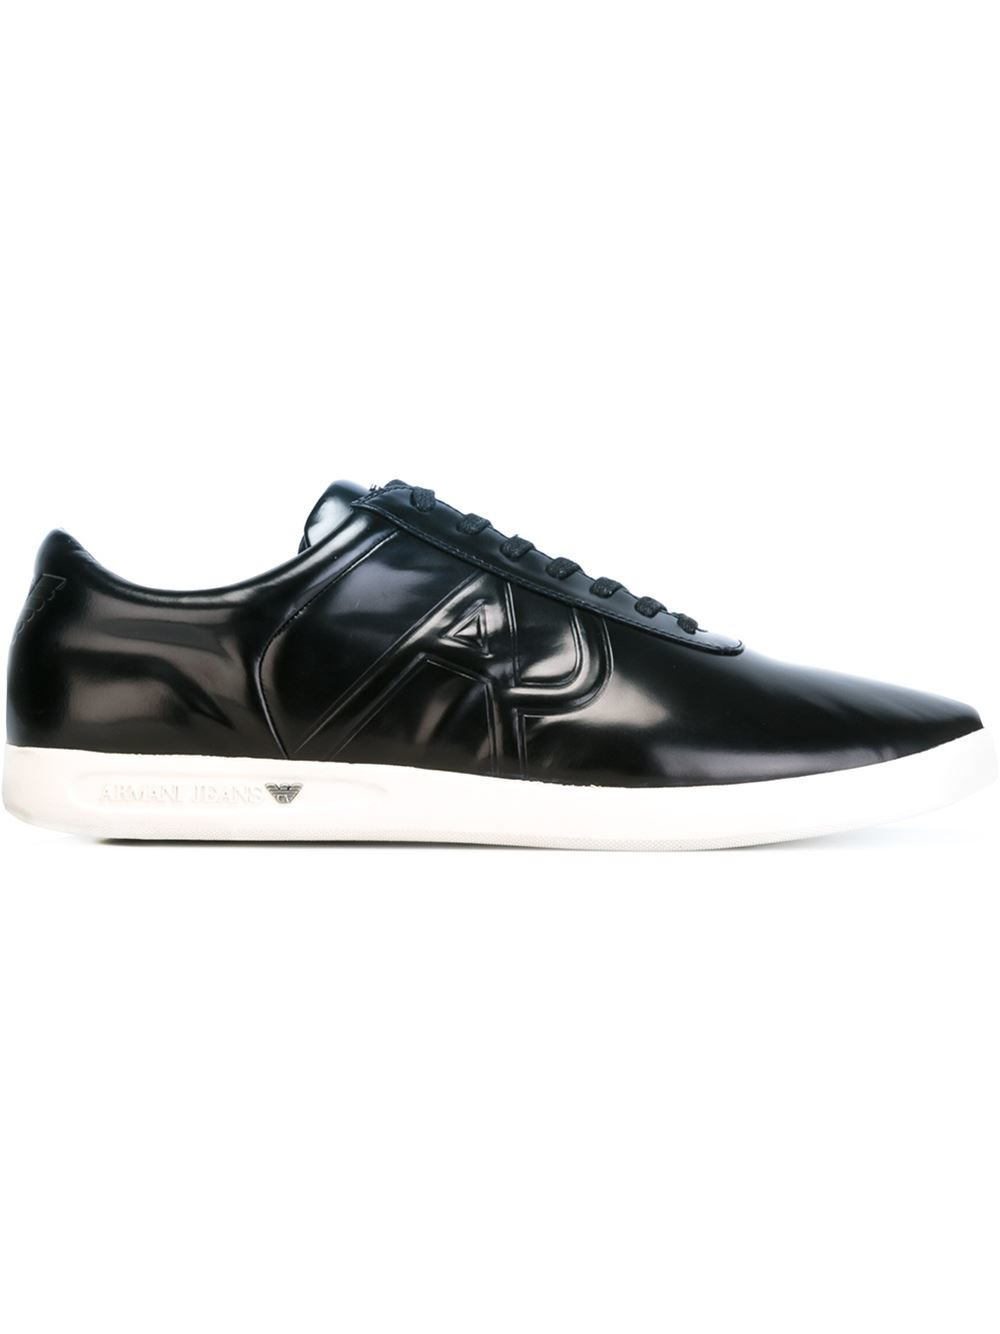 Armani Patent Leather Shoes   Black Mens